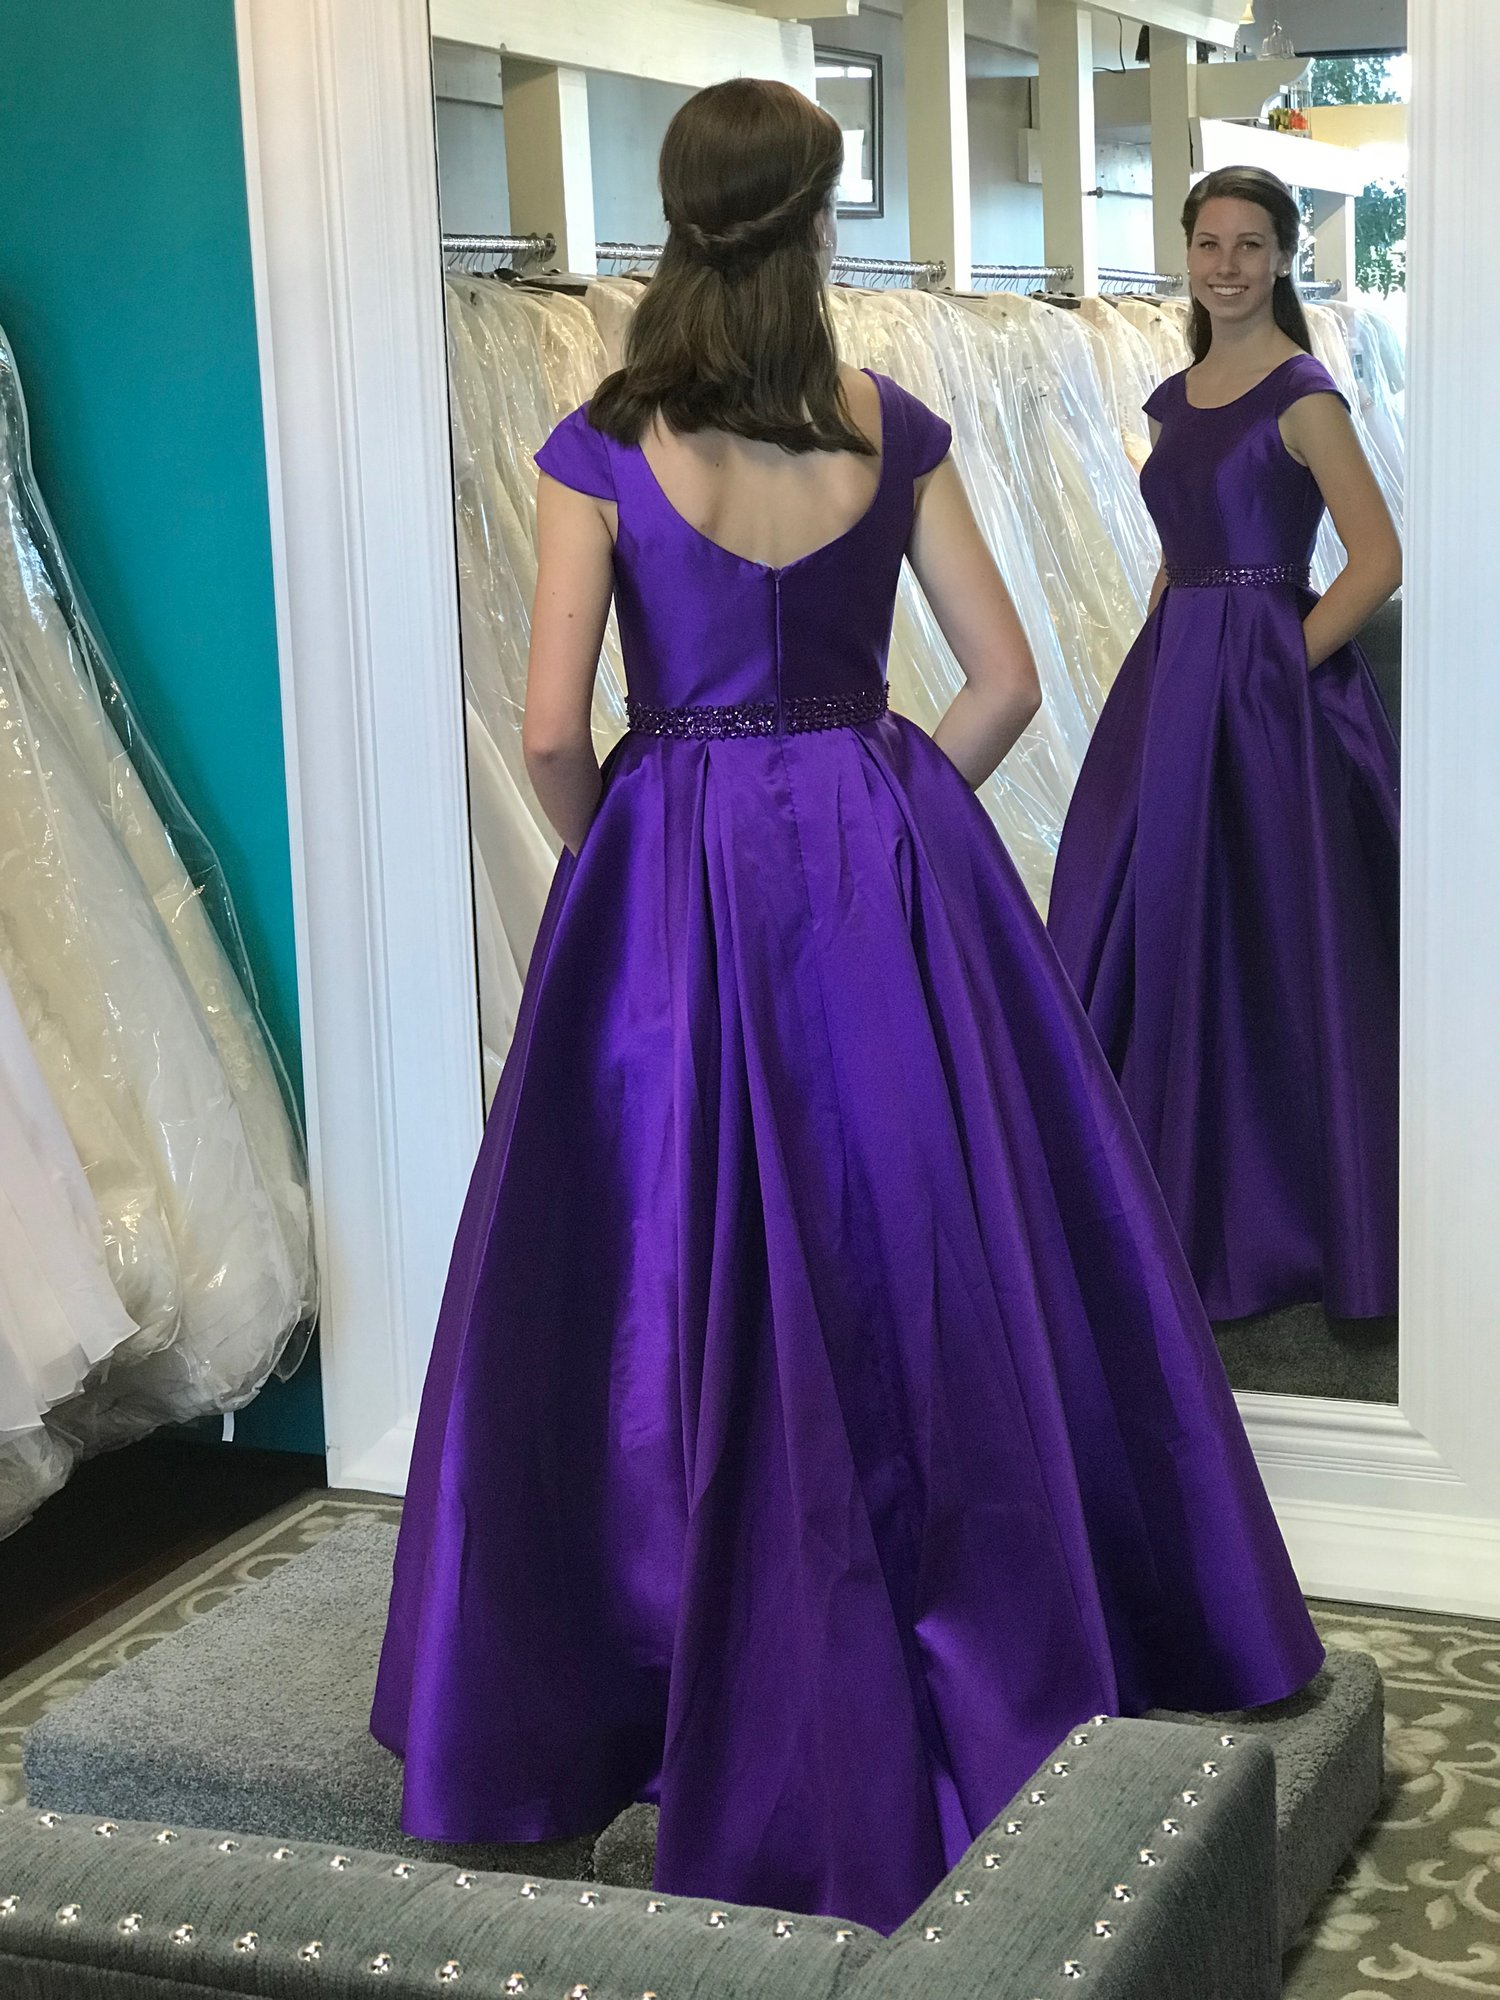 Prom & Formal — A Closet Full of Dresses